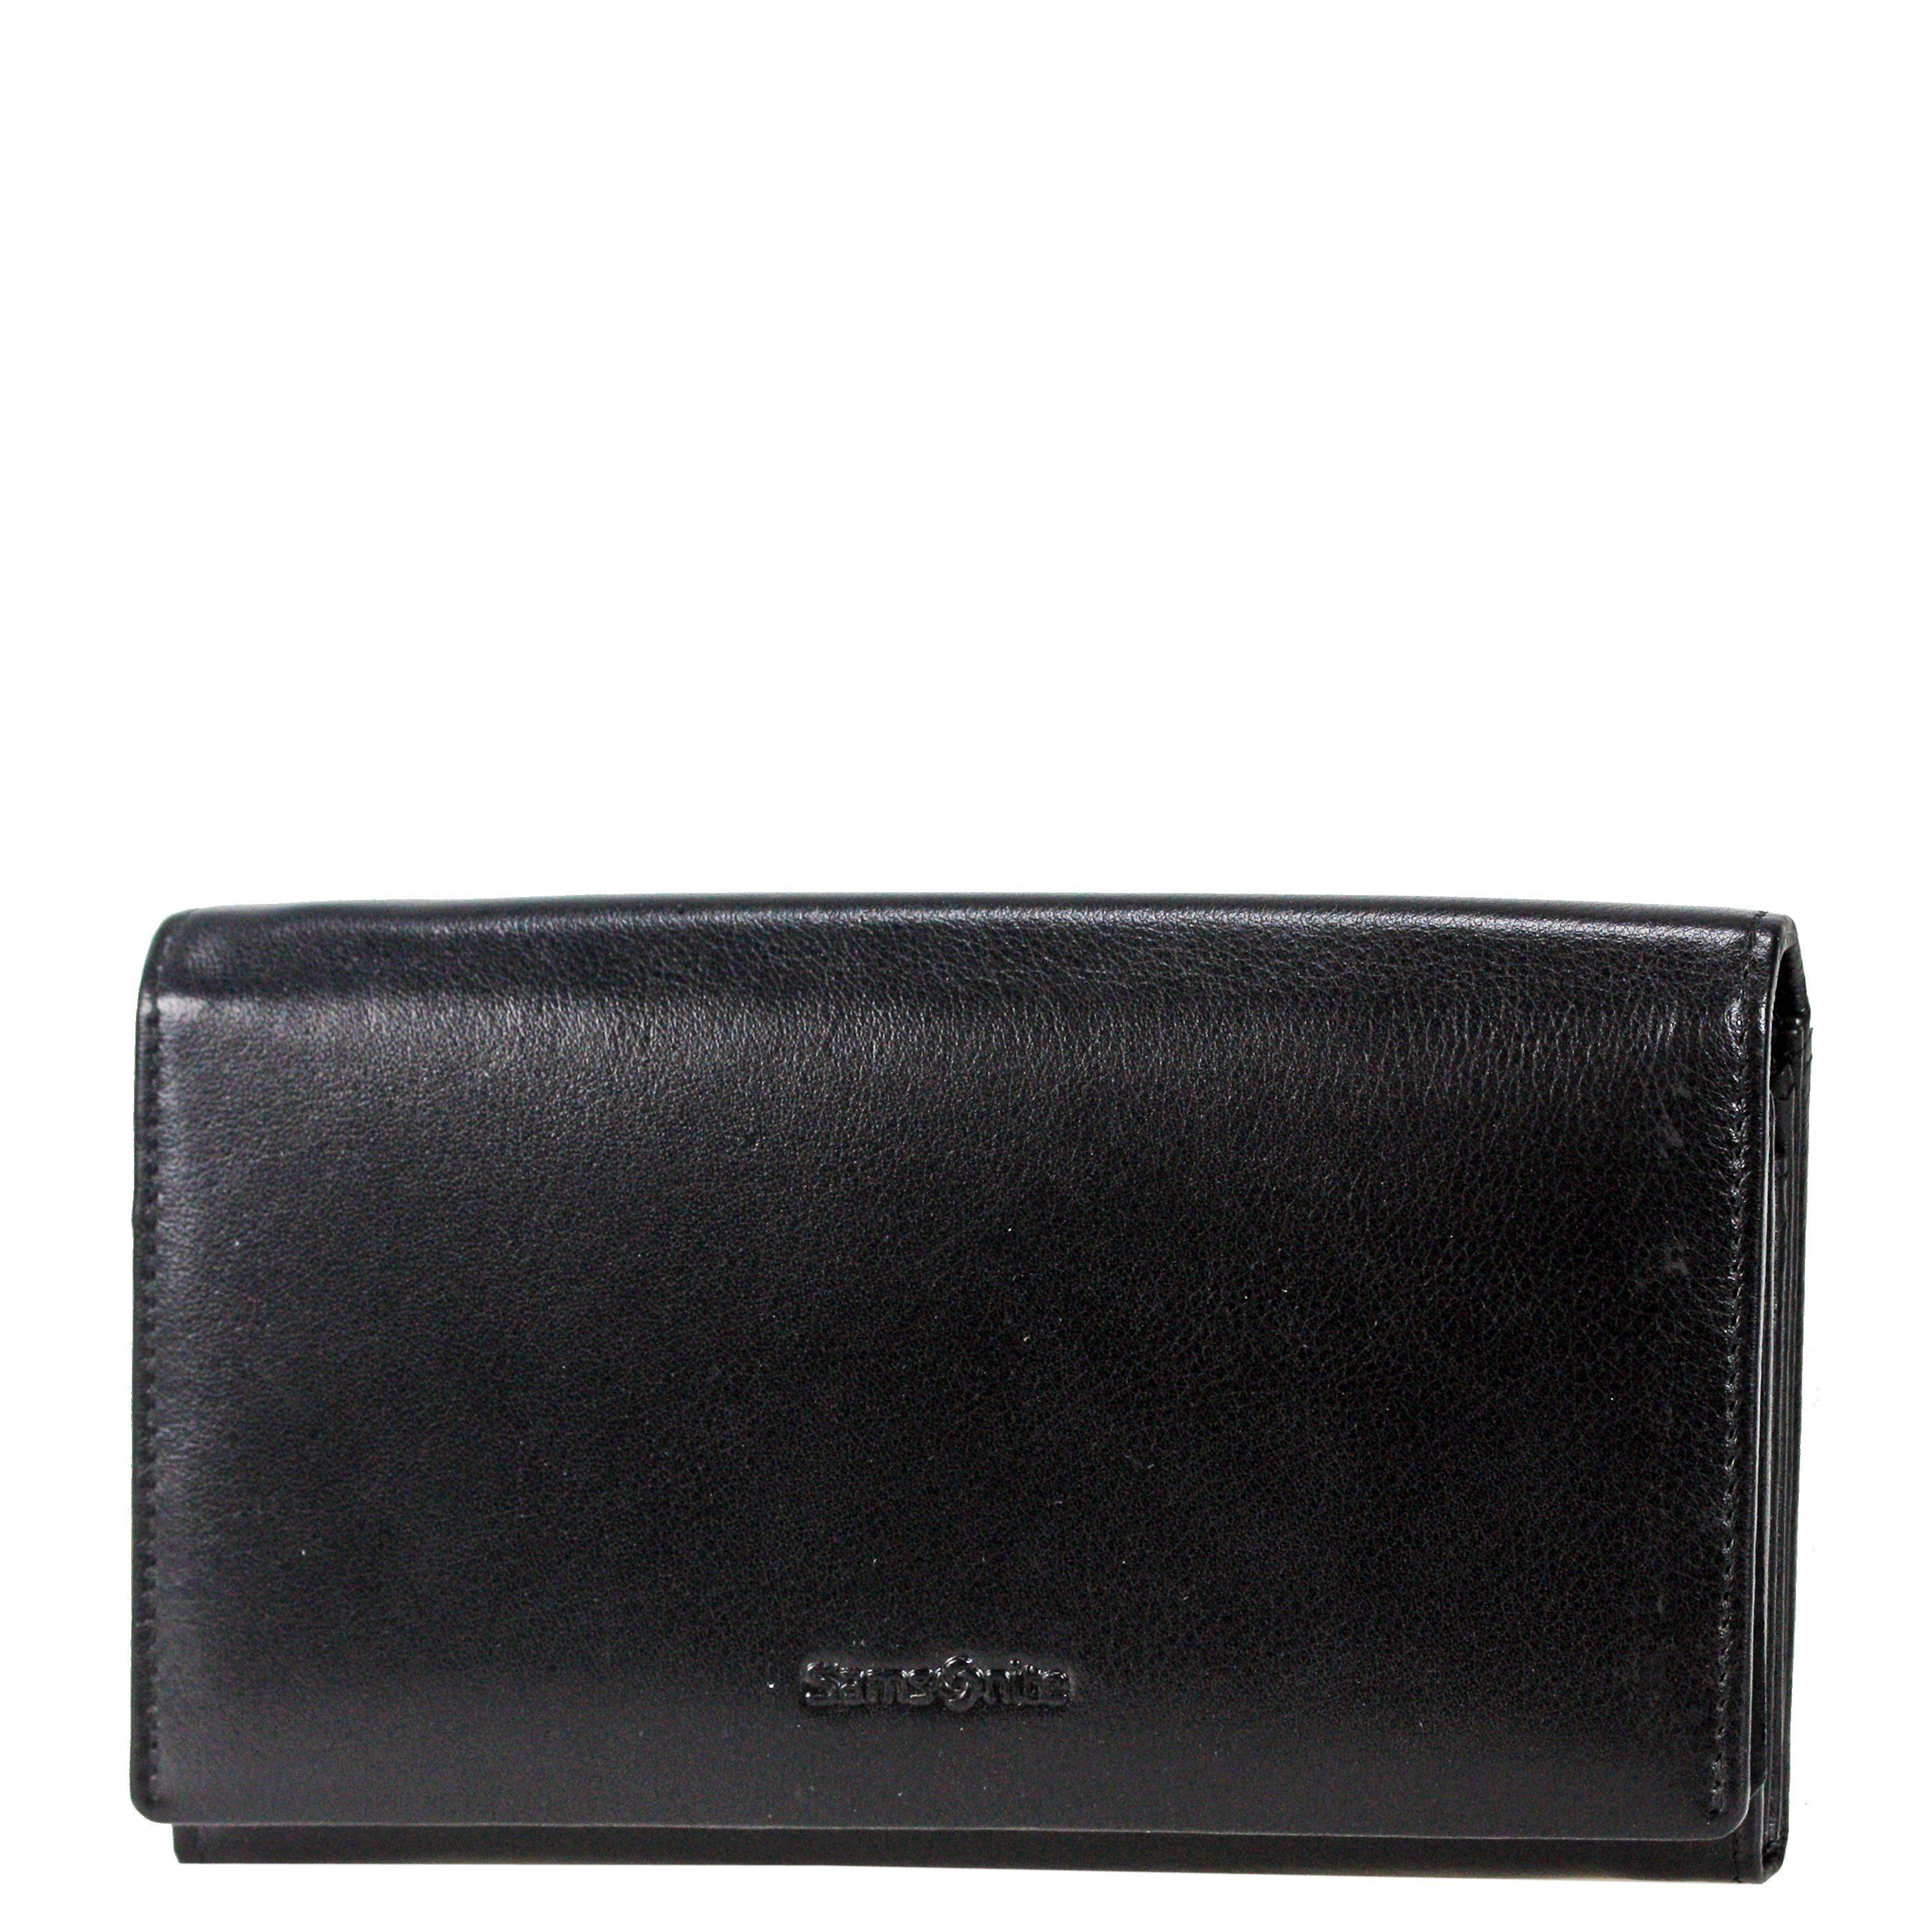 Samsonite Success SLG Damen-Geldbörse Leder 17 cm